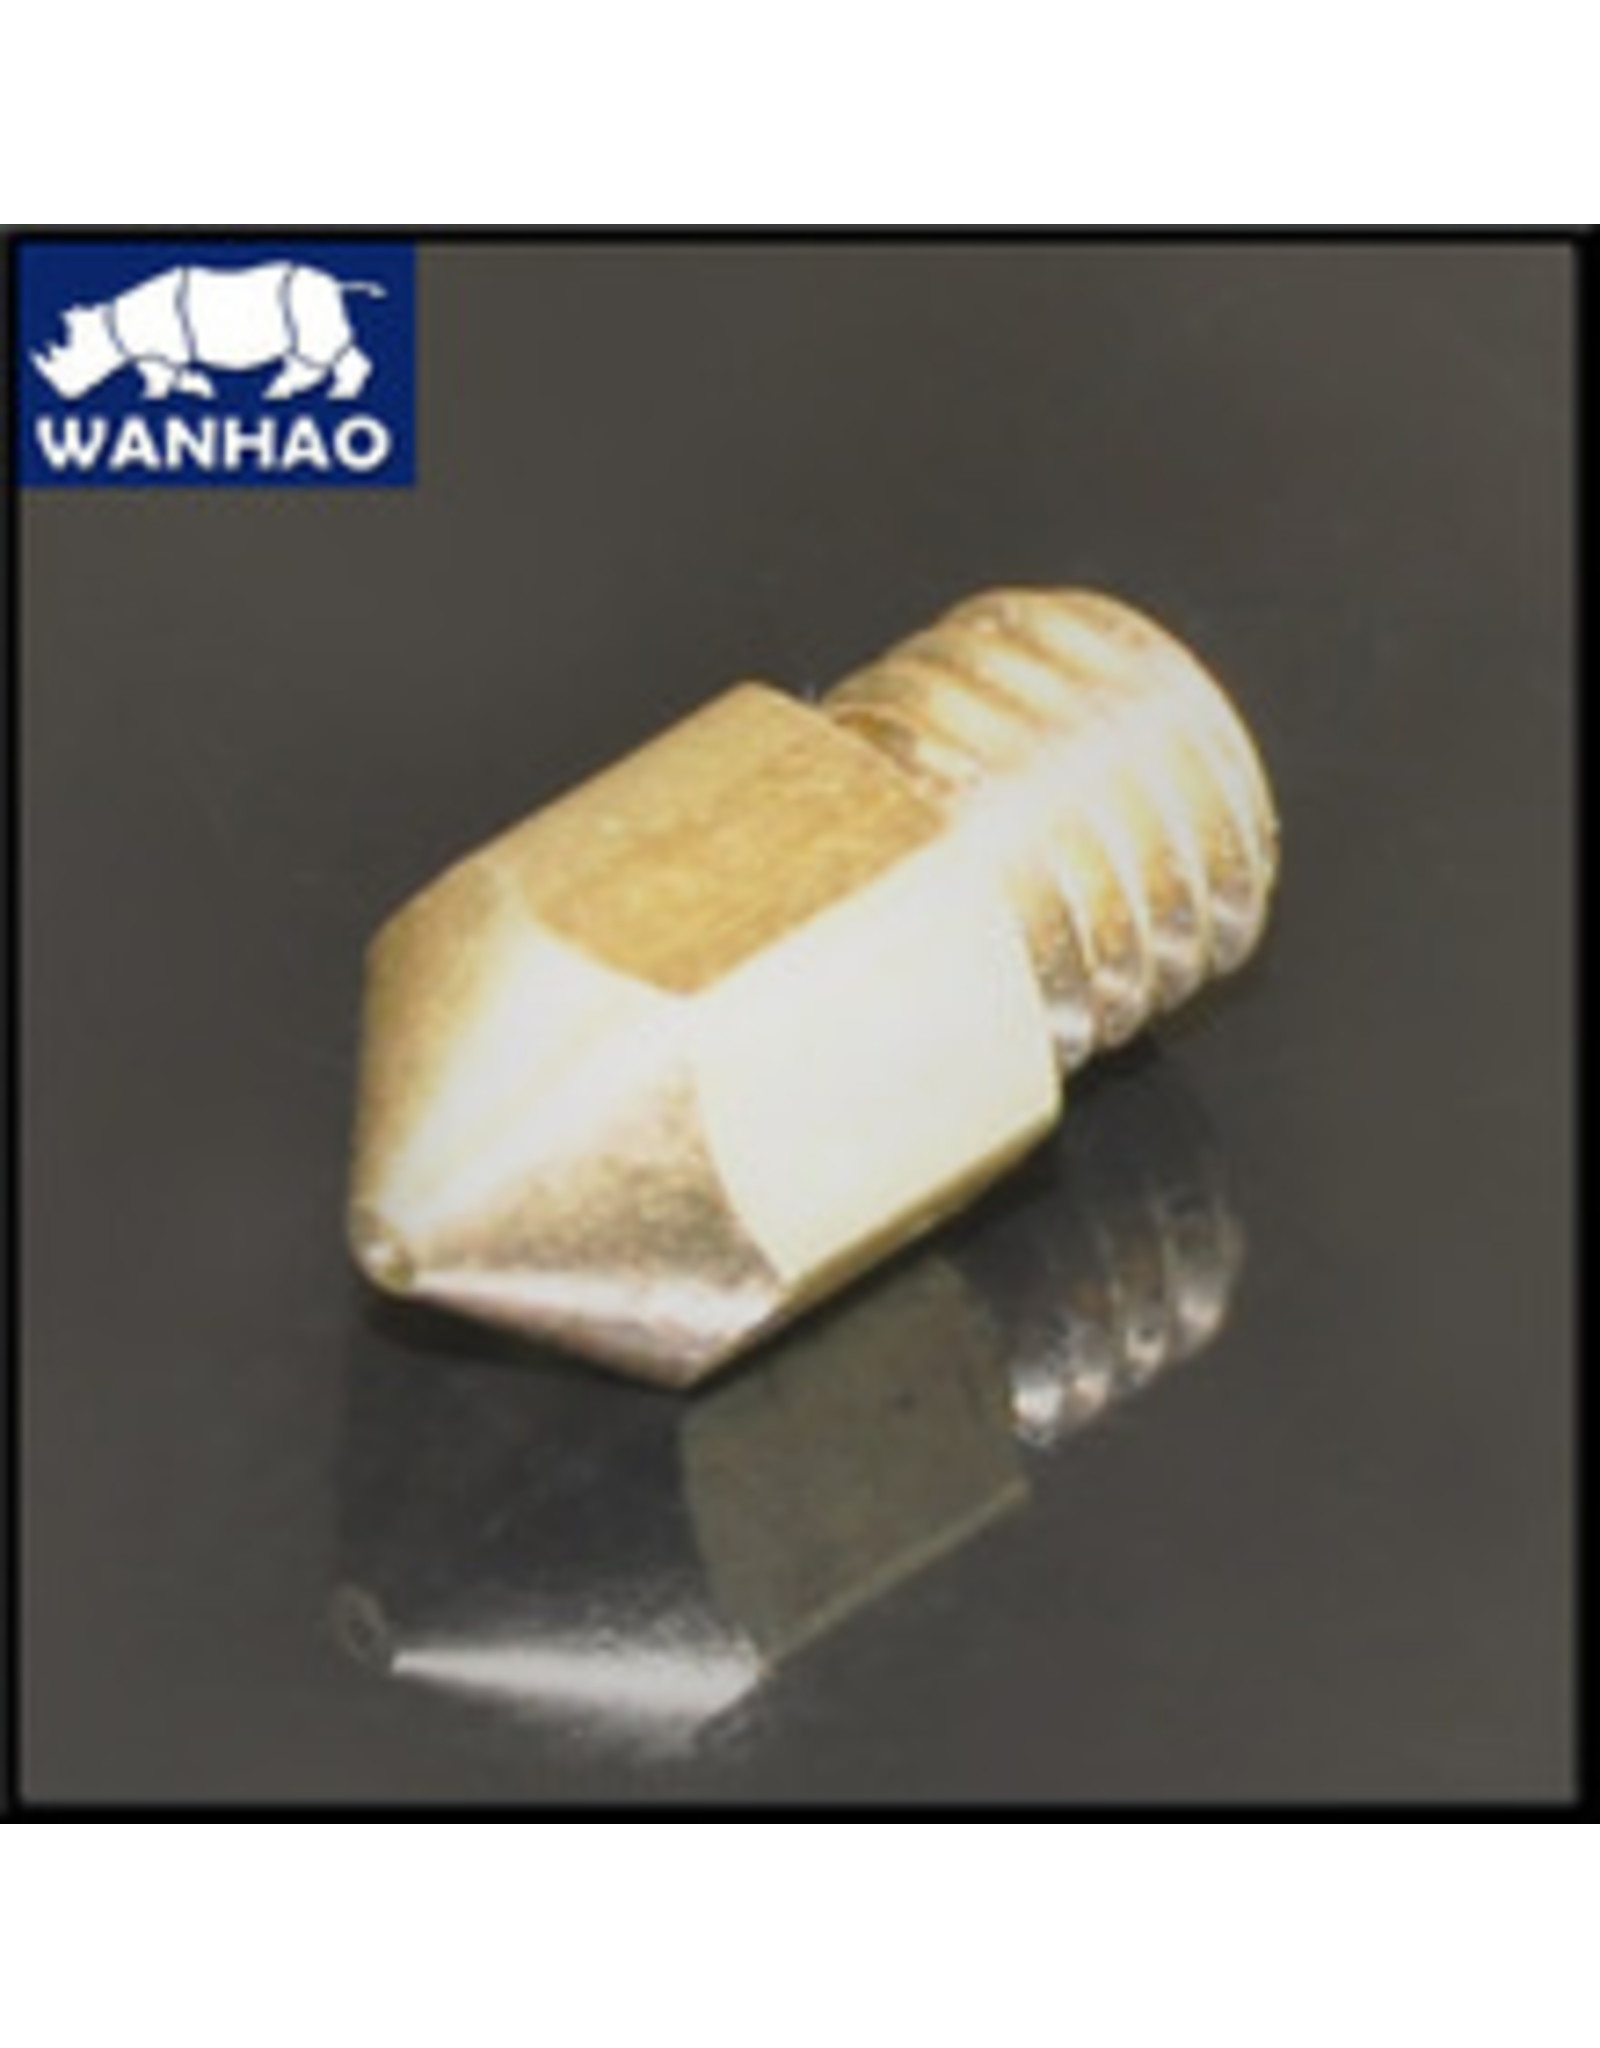 Wanhao Wanhao MK8/9 nozzle